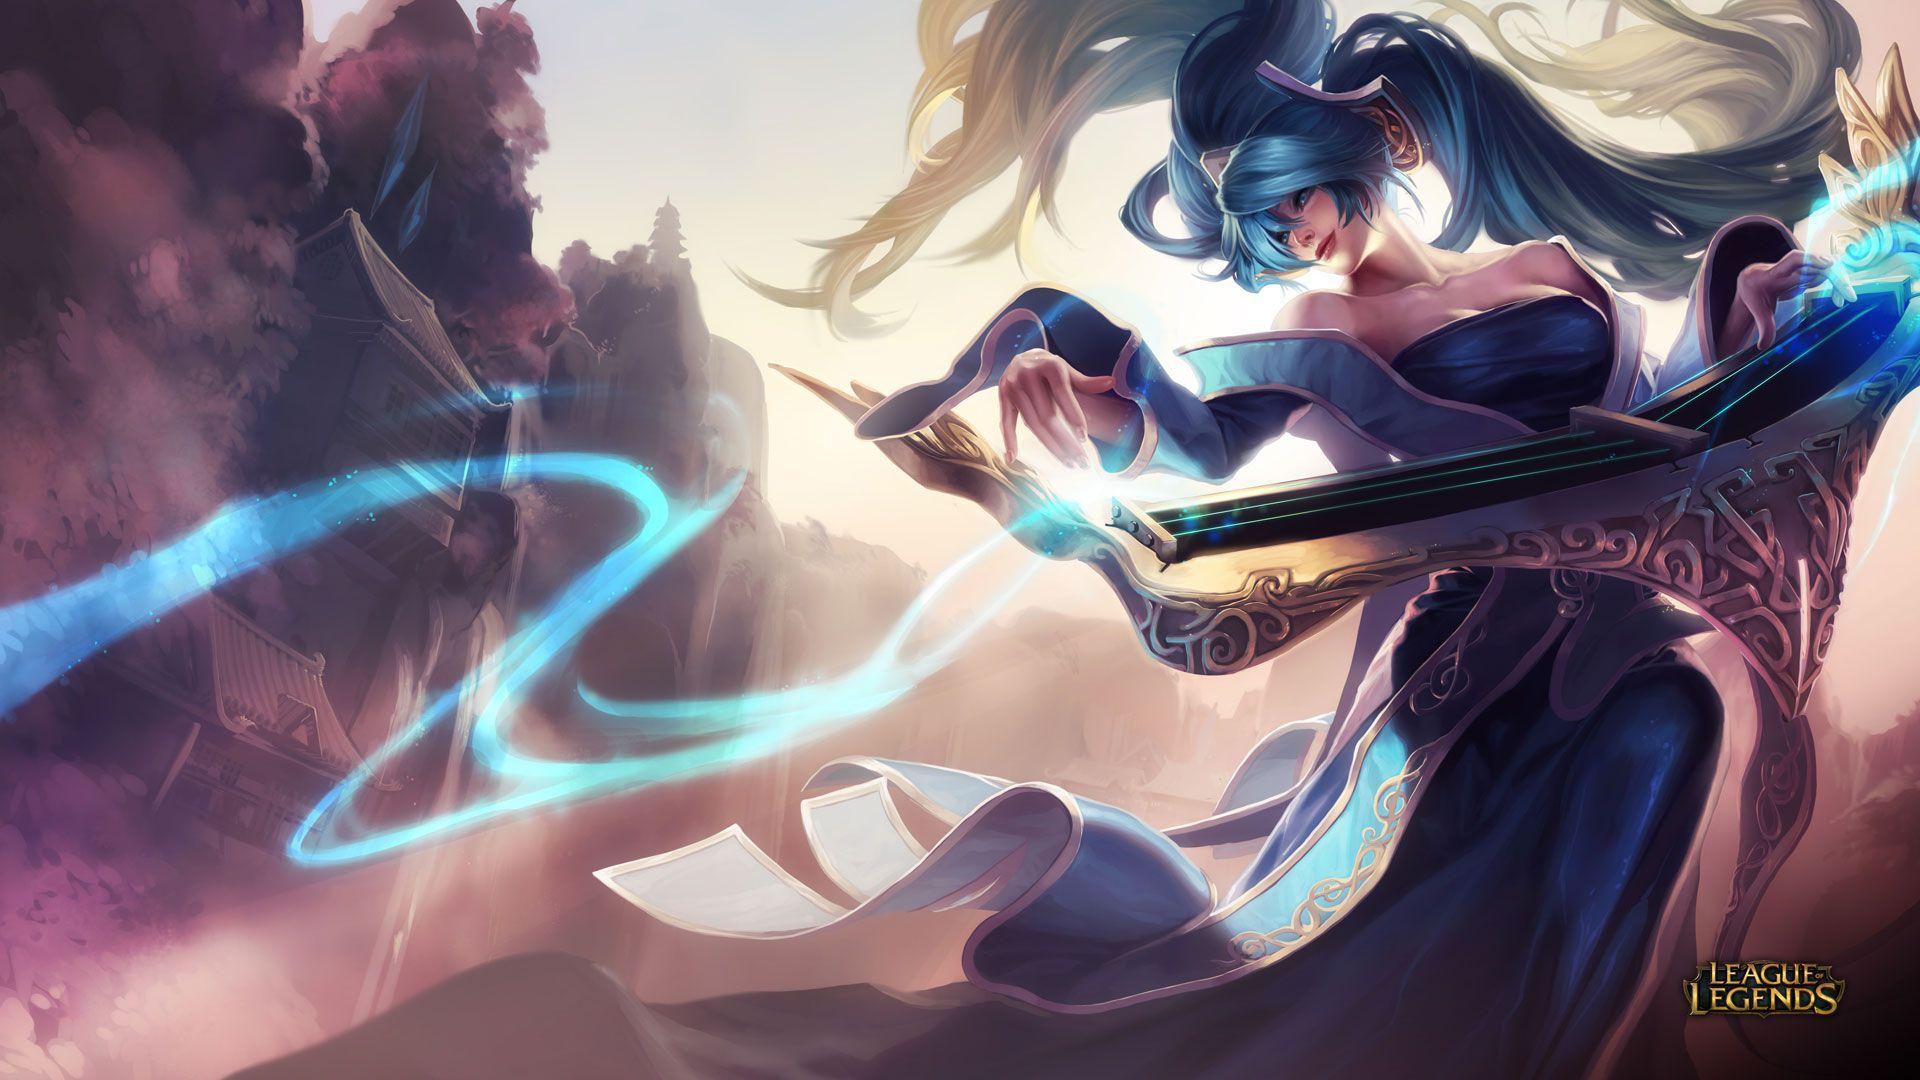 HD Sona Wallpaper - League of Legends Wallpapers